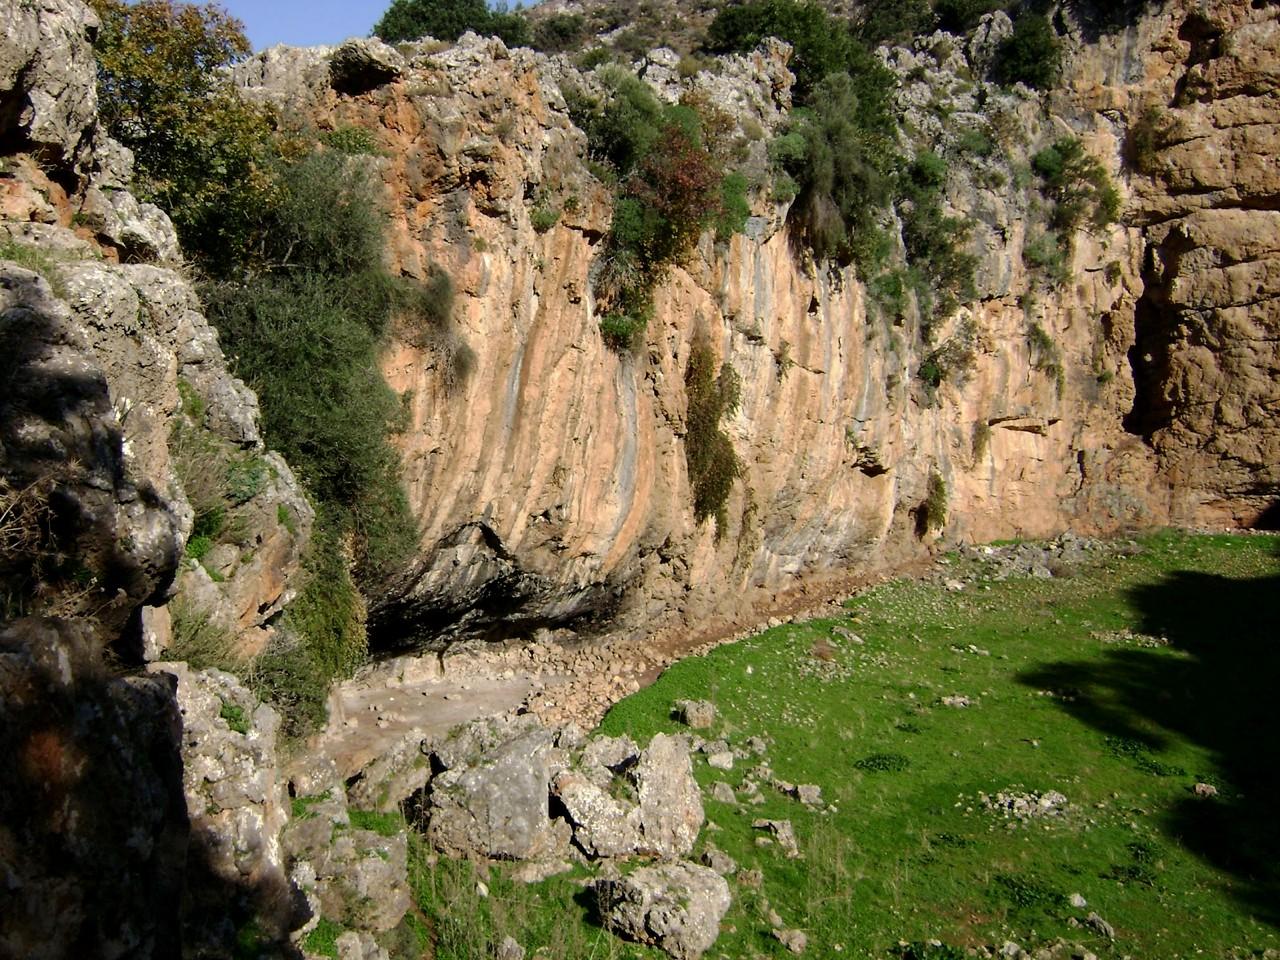 Stroumboulas Mountain Day Hiking Trip, crete hiking trekking, hiking nearby heraklion crete, best activities crete, stouboulas mountain hiking trekking